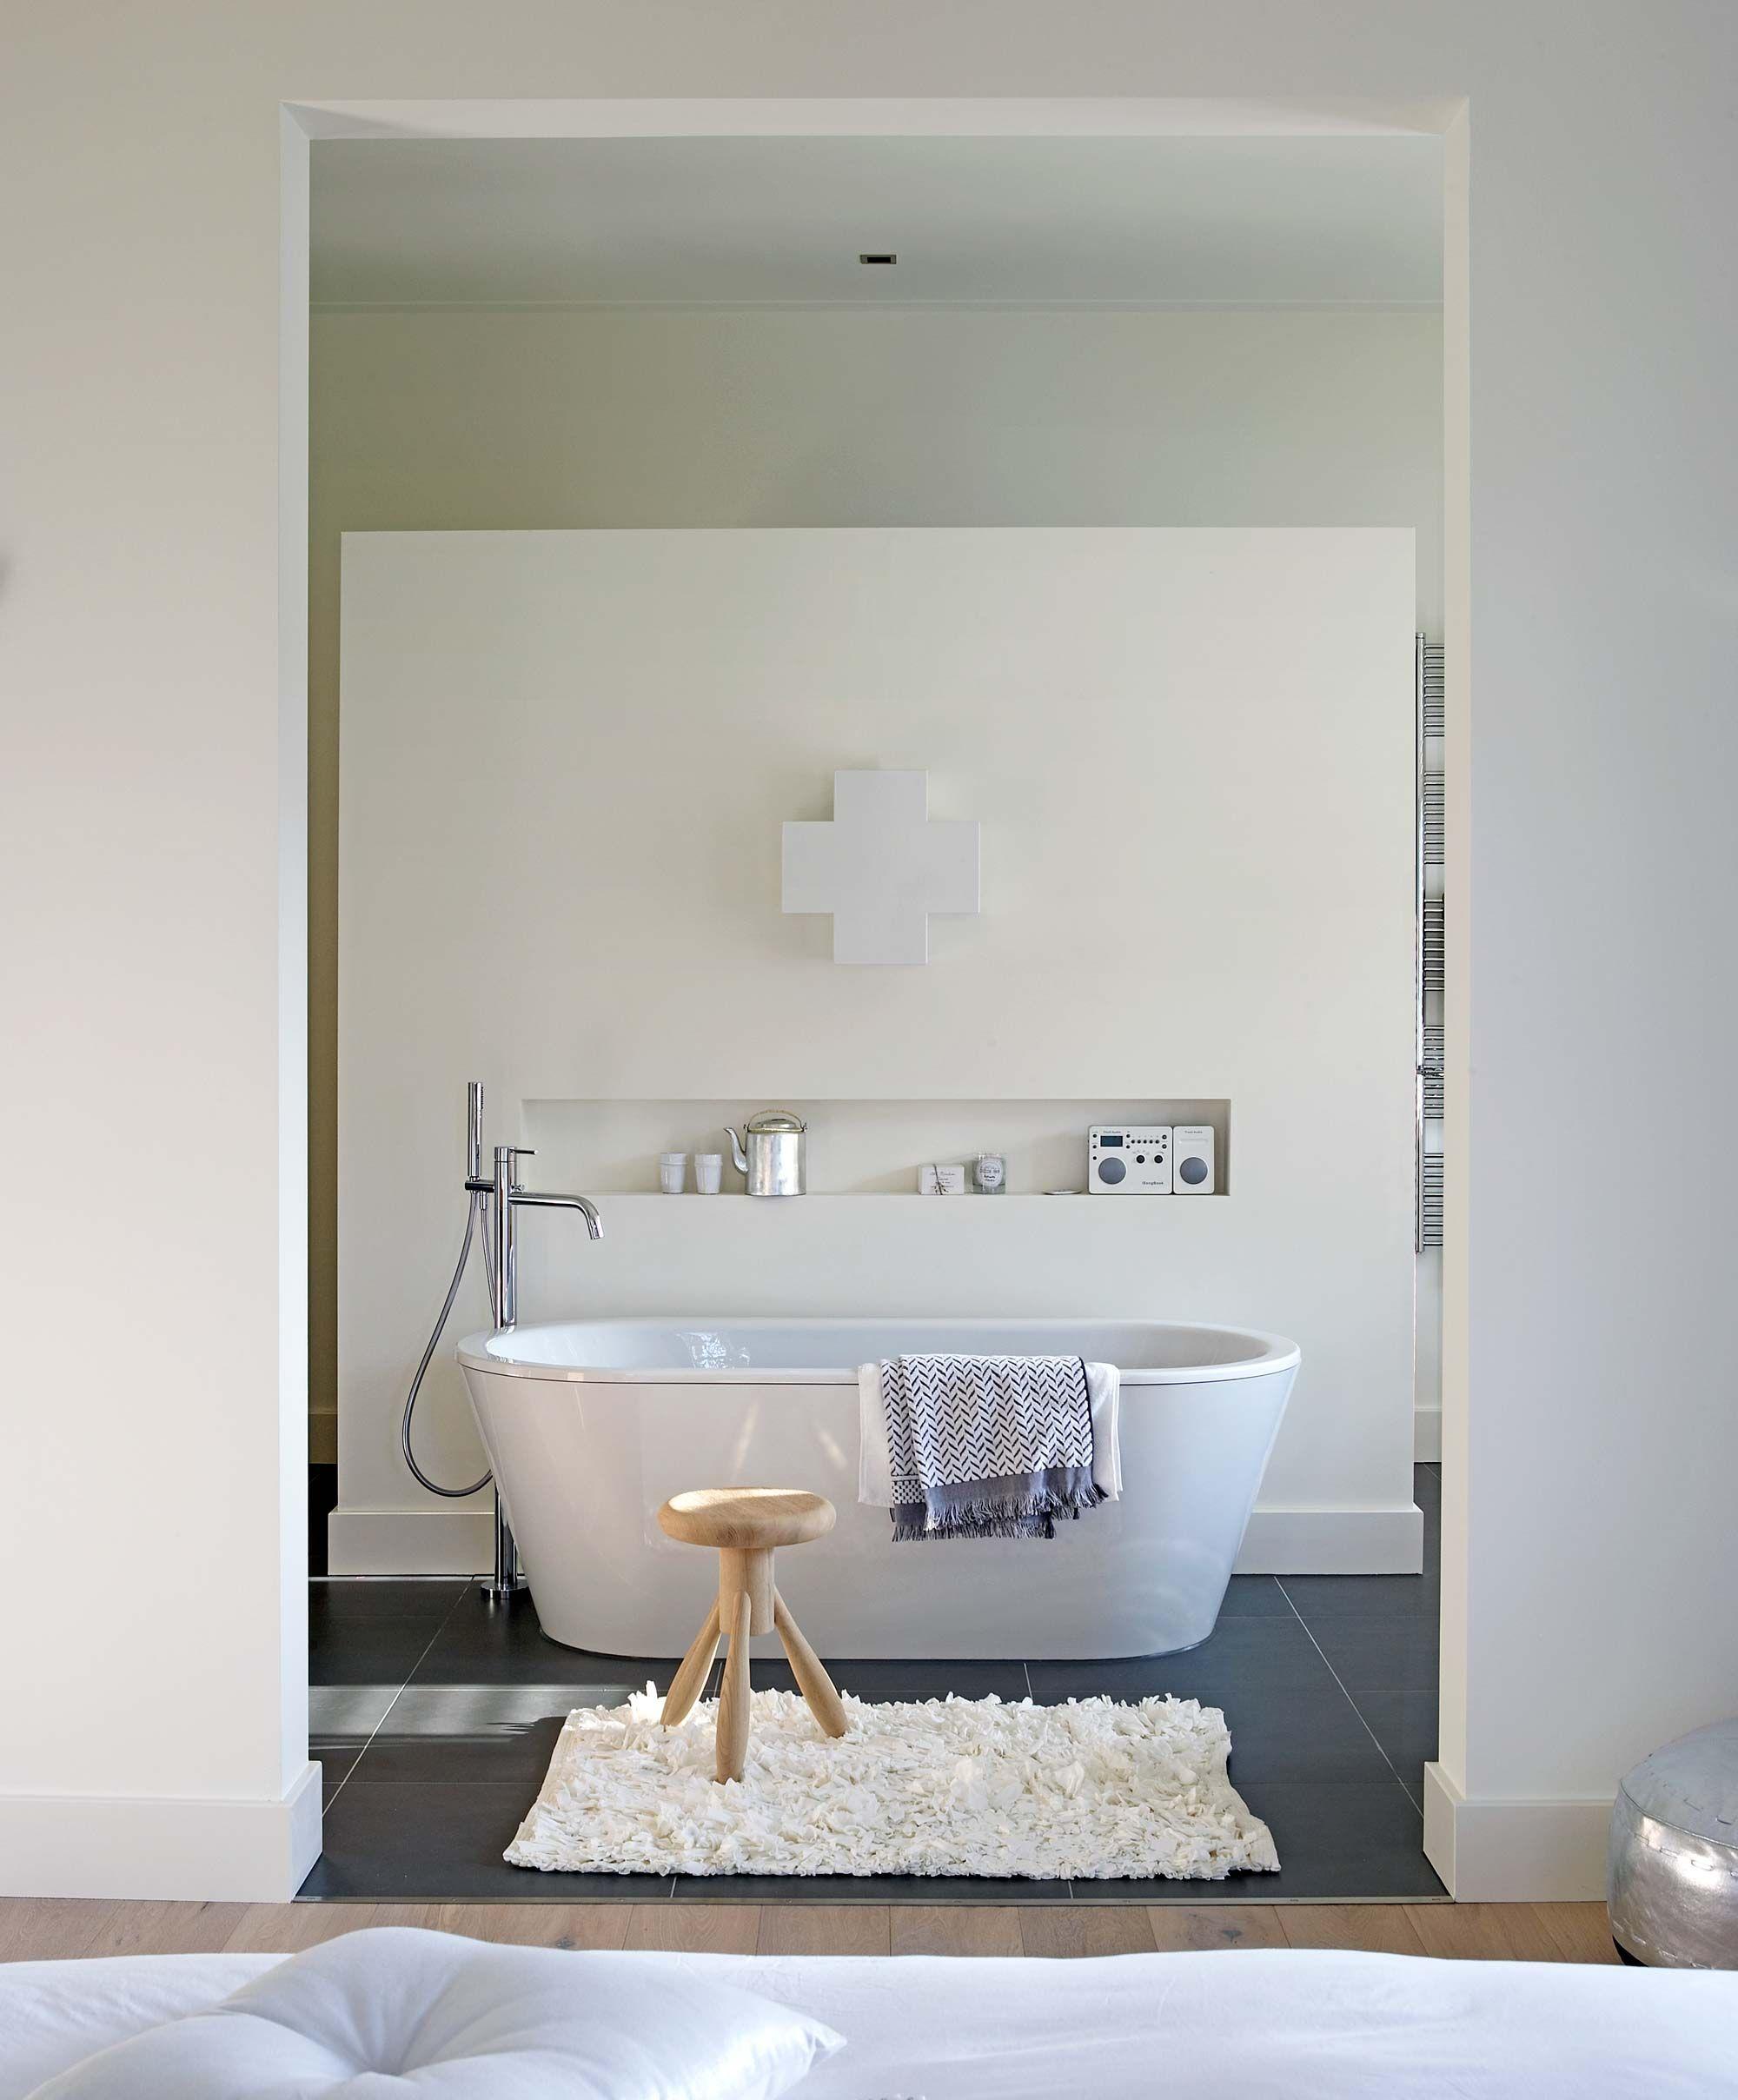 duurzame badkamer met bad collage badkamer pinterest bad